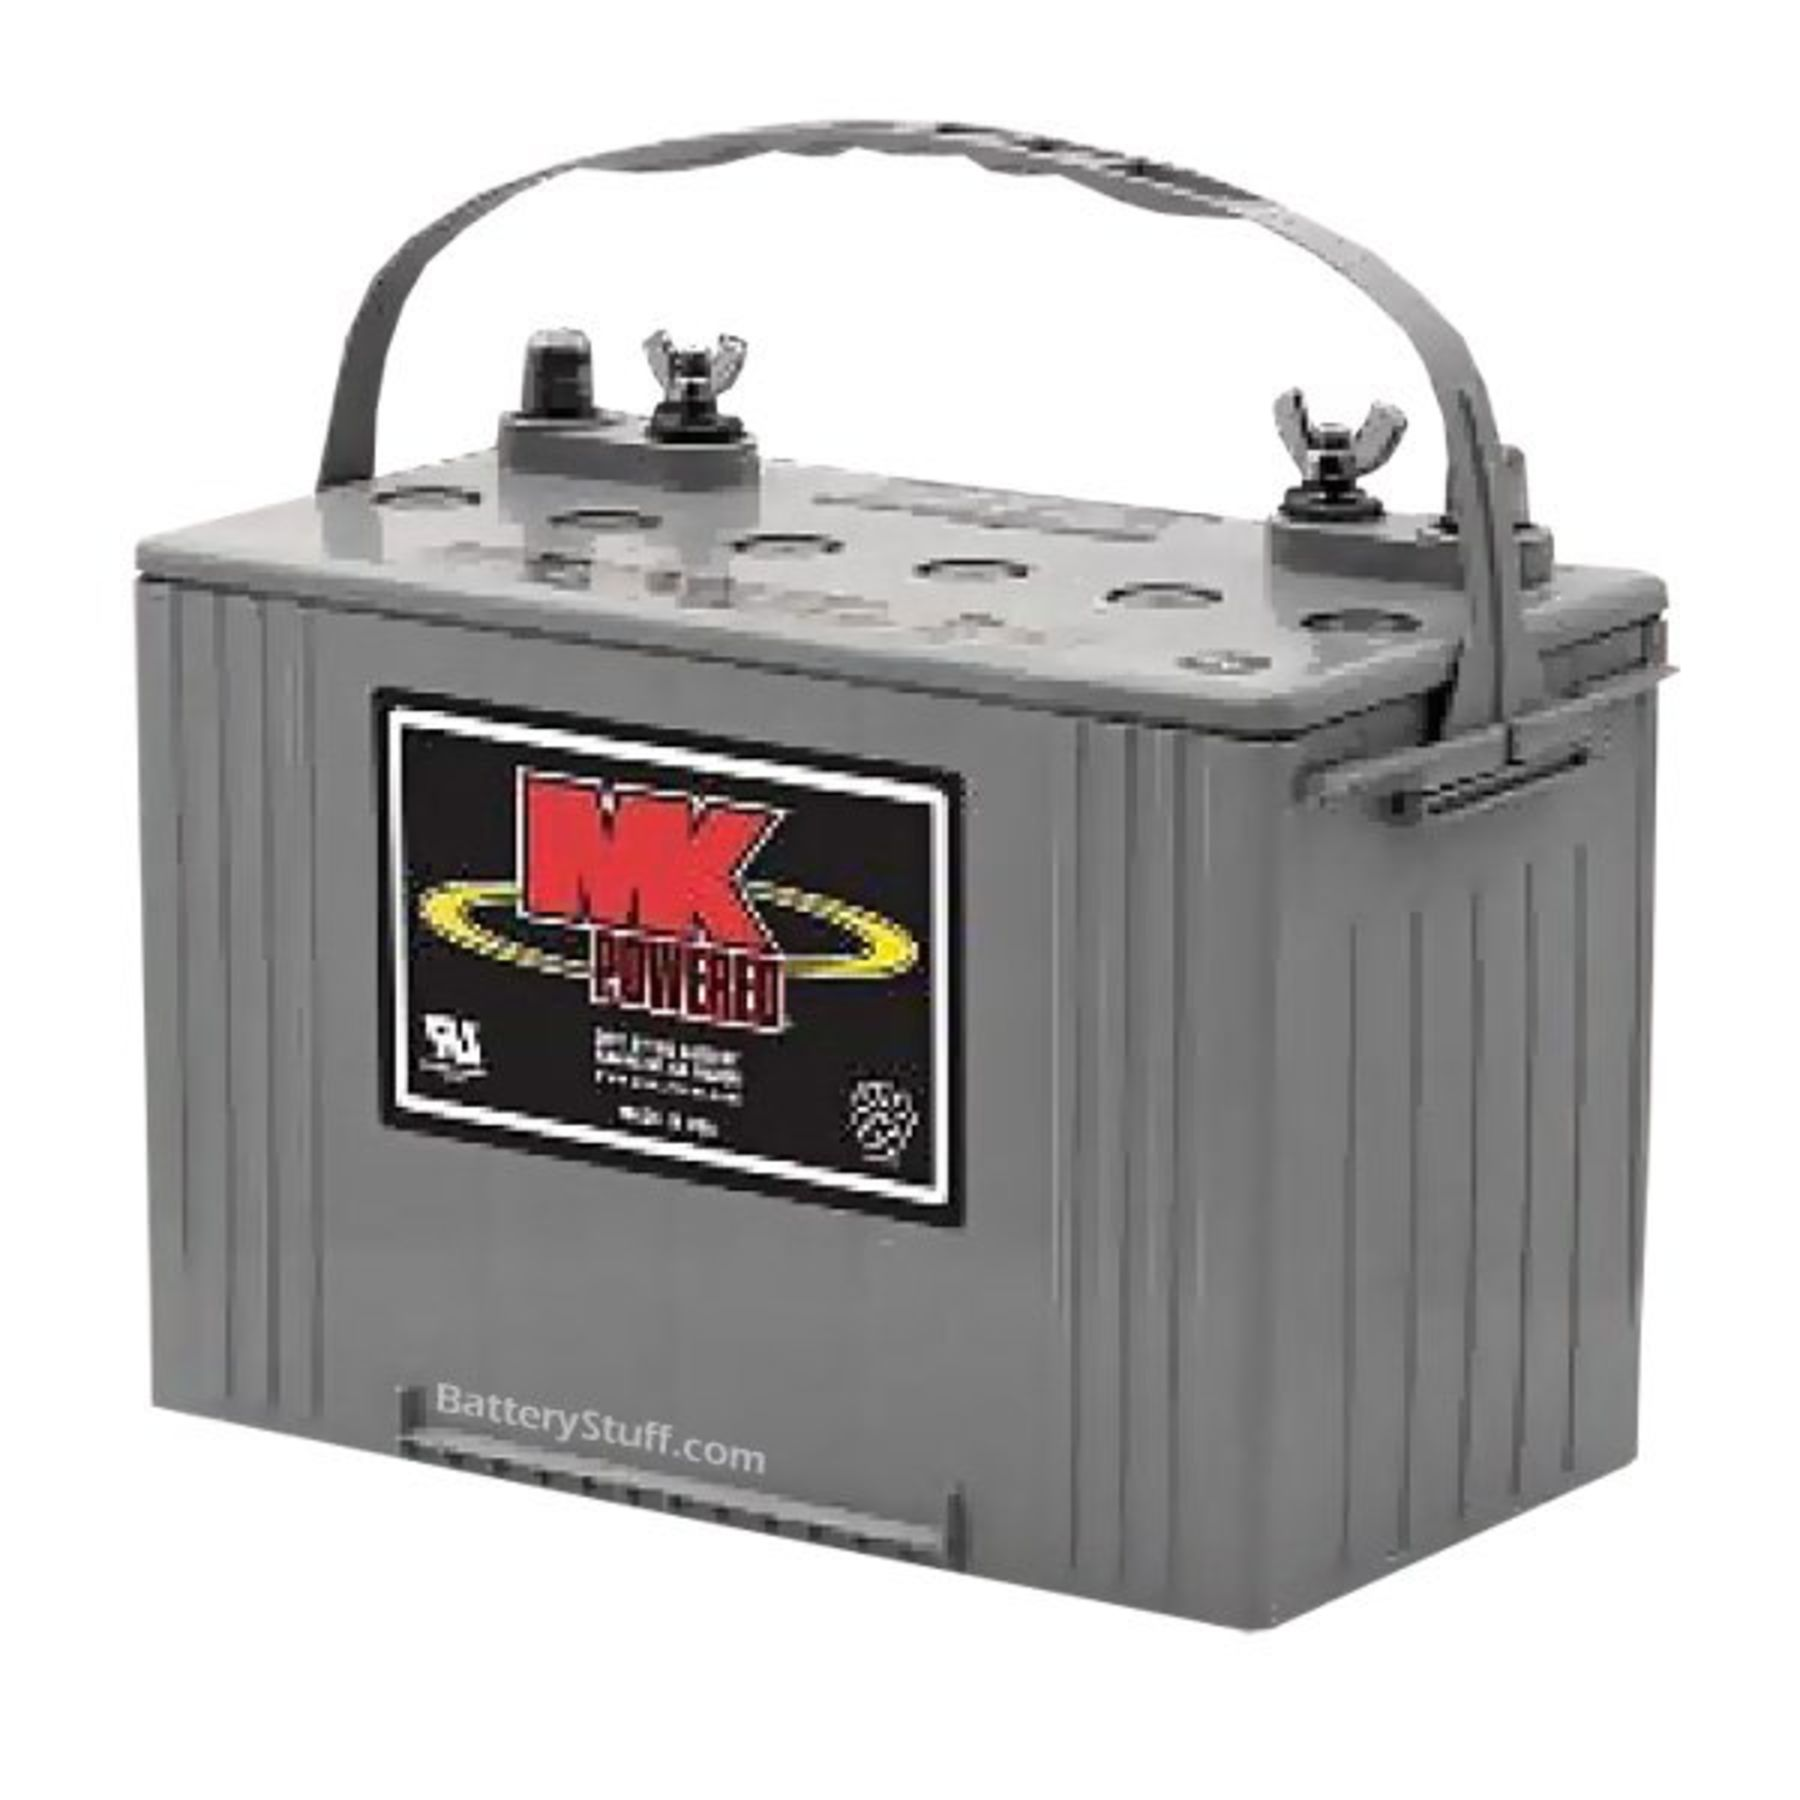 mk battery 12 volt 86 ah deep cycle gel rv marine battery. Black Bedroom Furniture Sets. Home Design Ideas